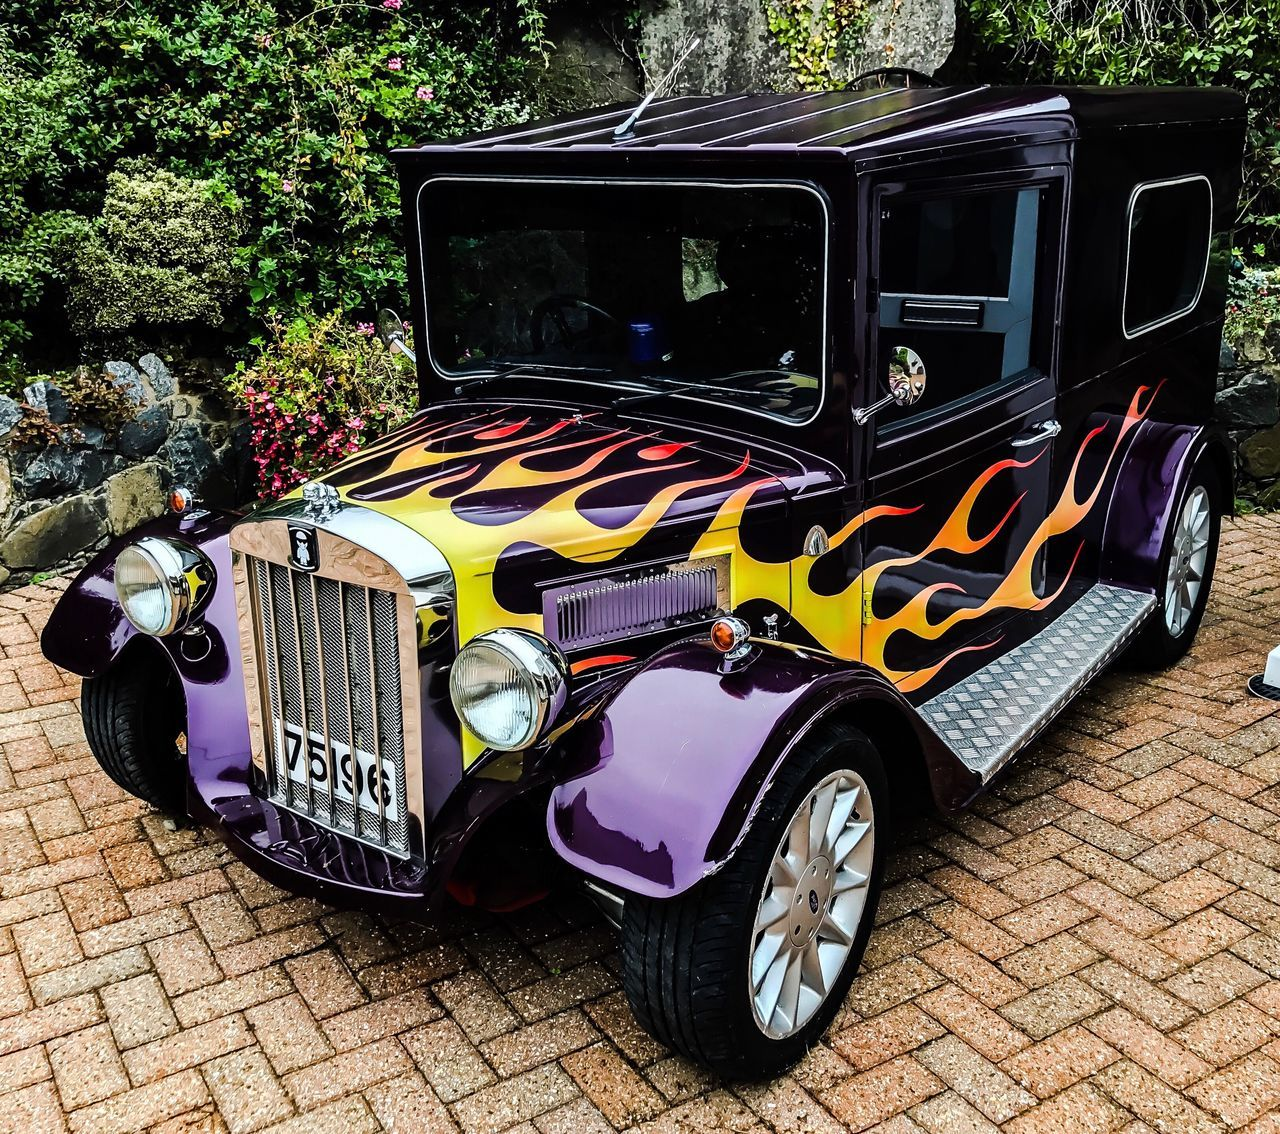 Outdoors Land Vehicle Day No People Nature Car Purple Fire Flame Guernsey EyeEmBestPics EyeEm Best Shots EyeEm EyeEm Gallery